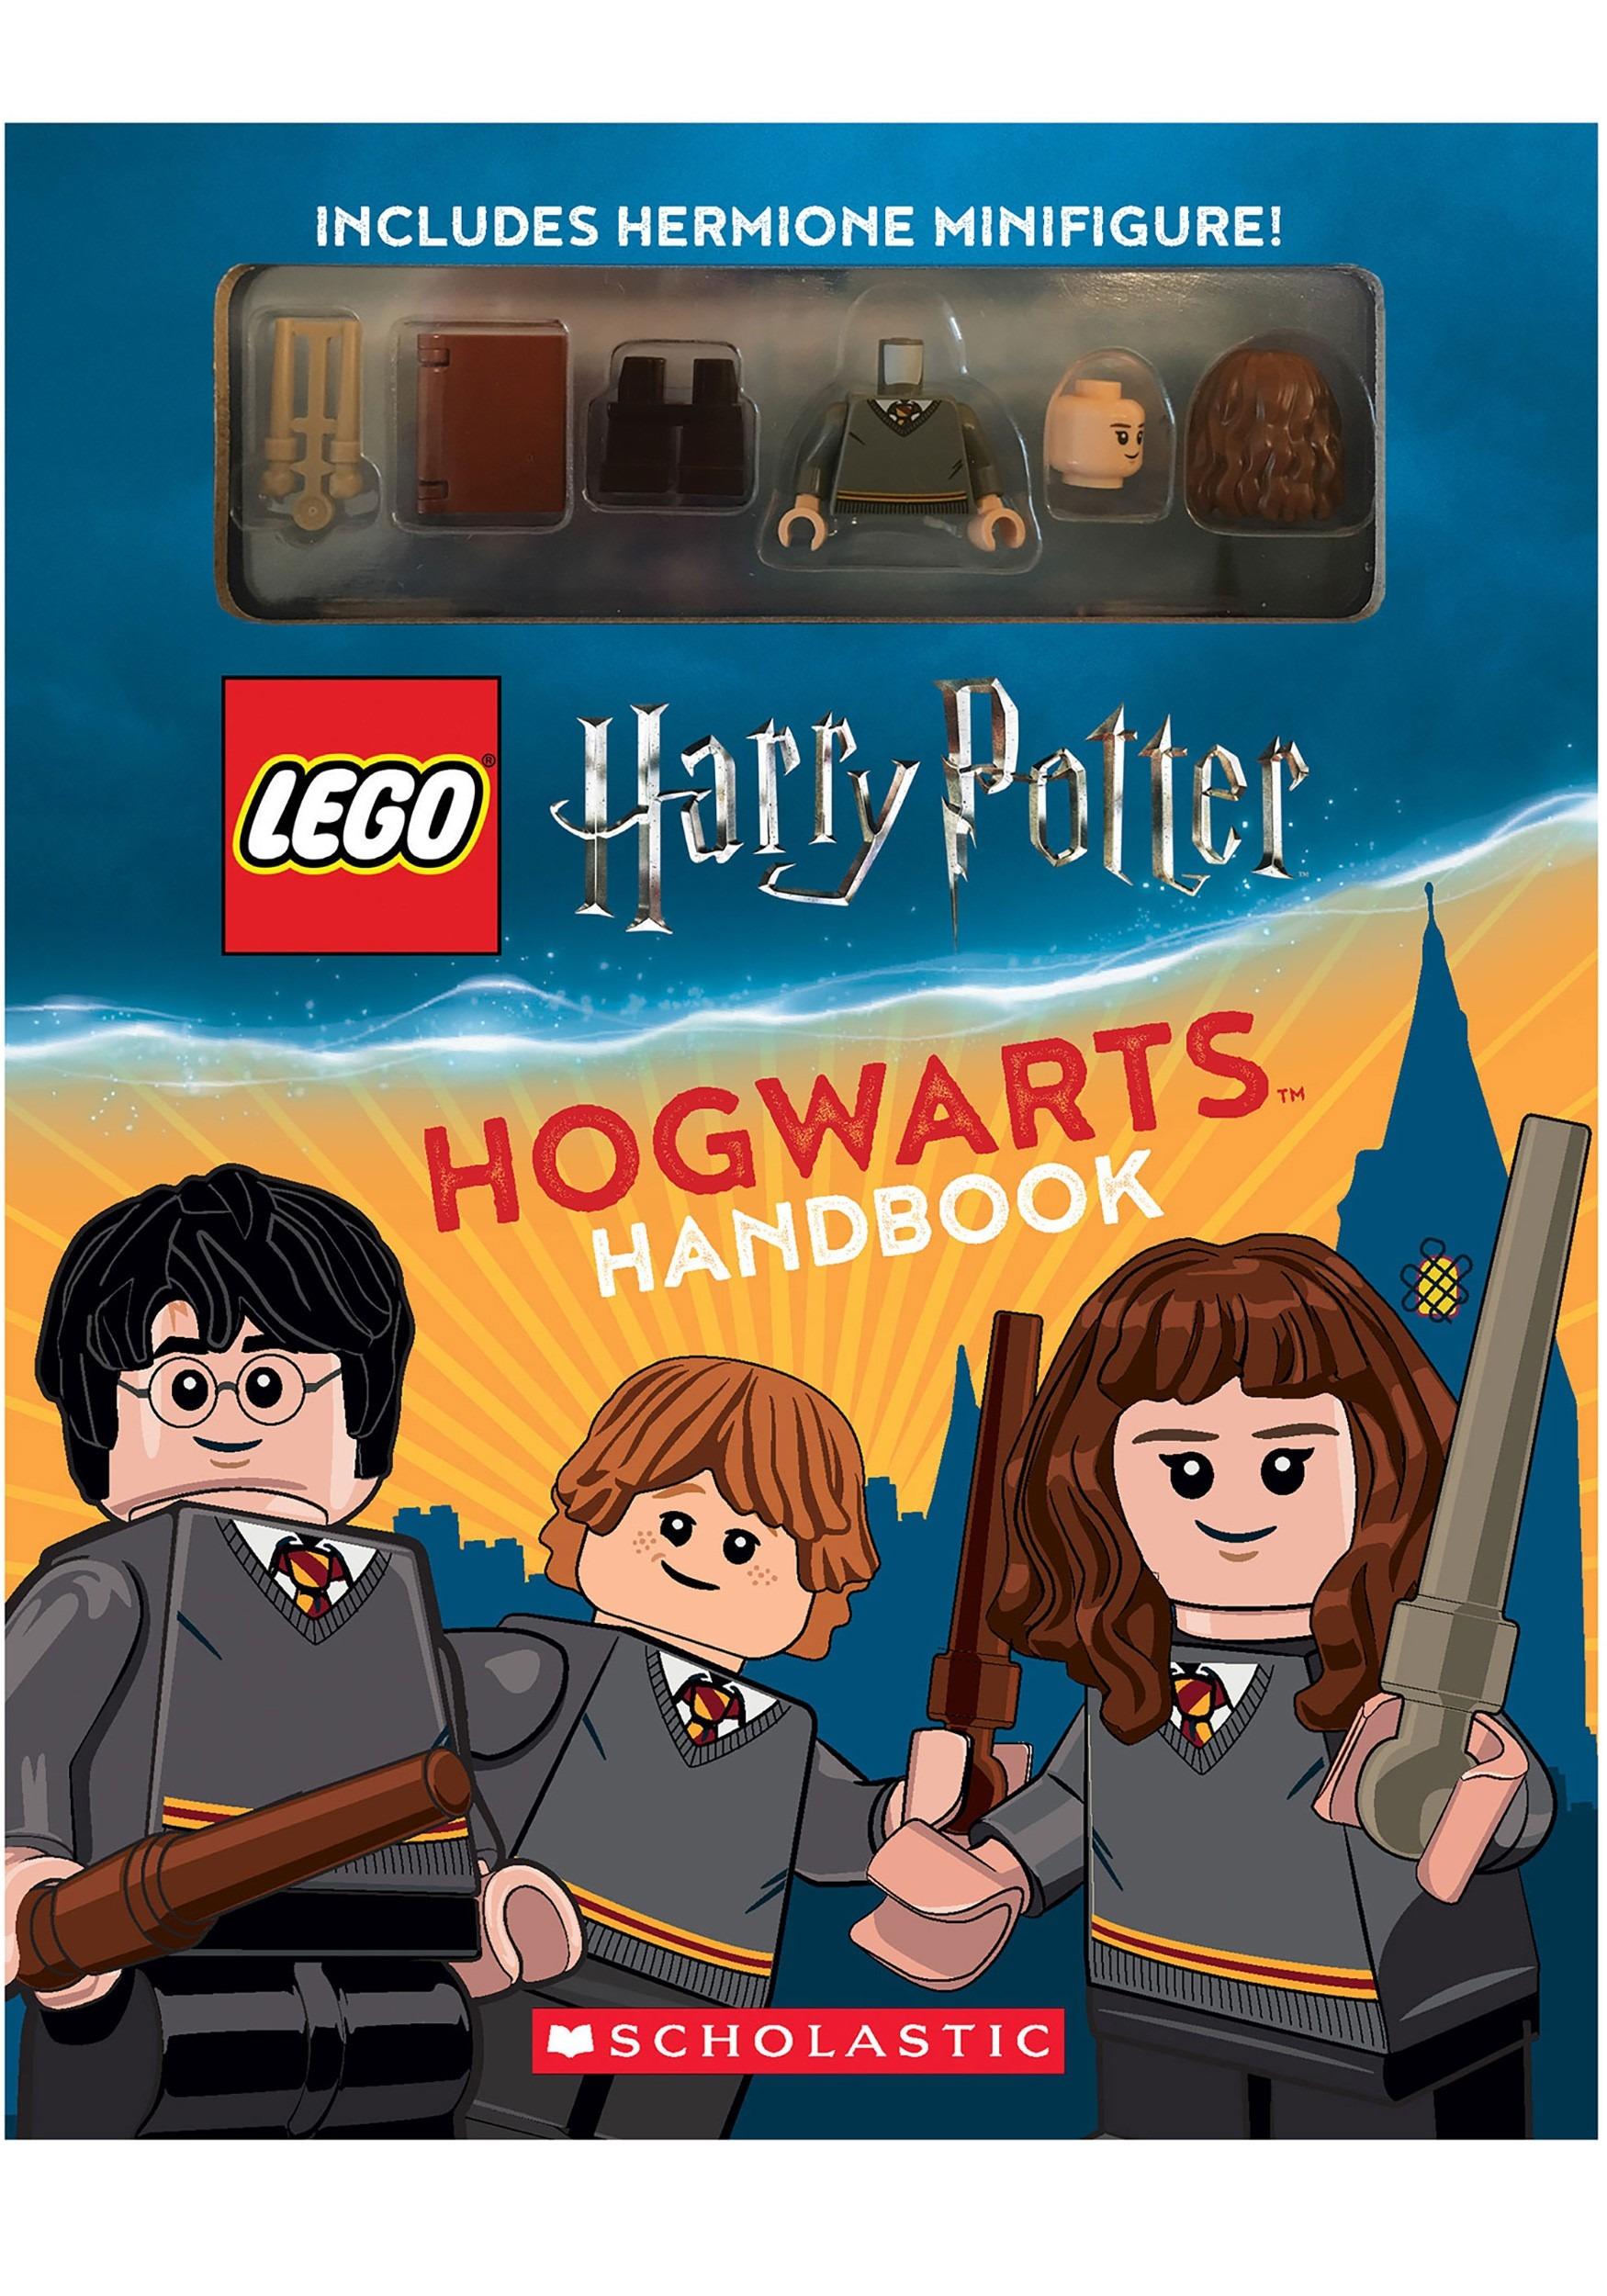 Harry Potter: LEGO Hogwarts Handbook with Hermione